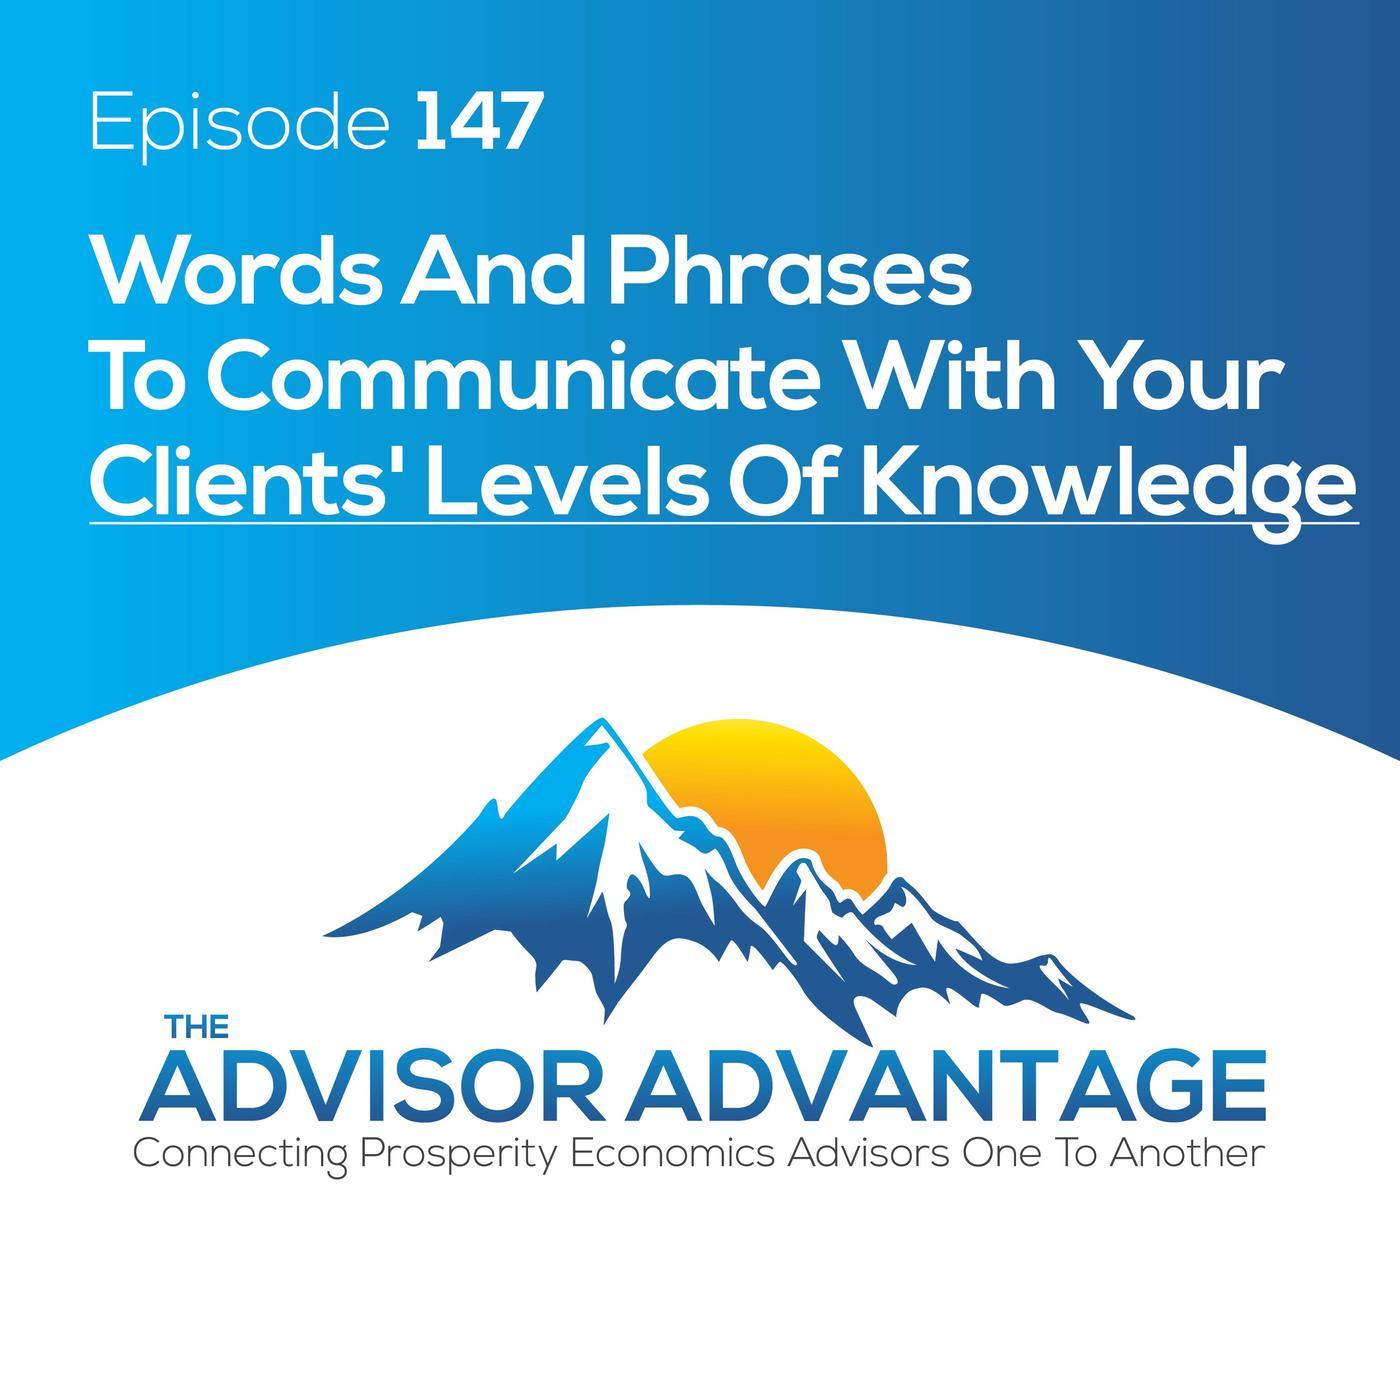 The Advisor Advantage (podcast) - Kim Butler and Tammi